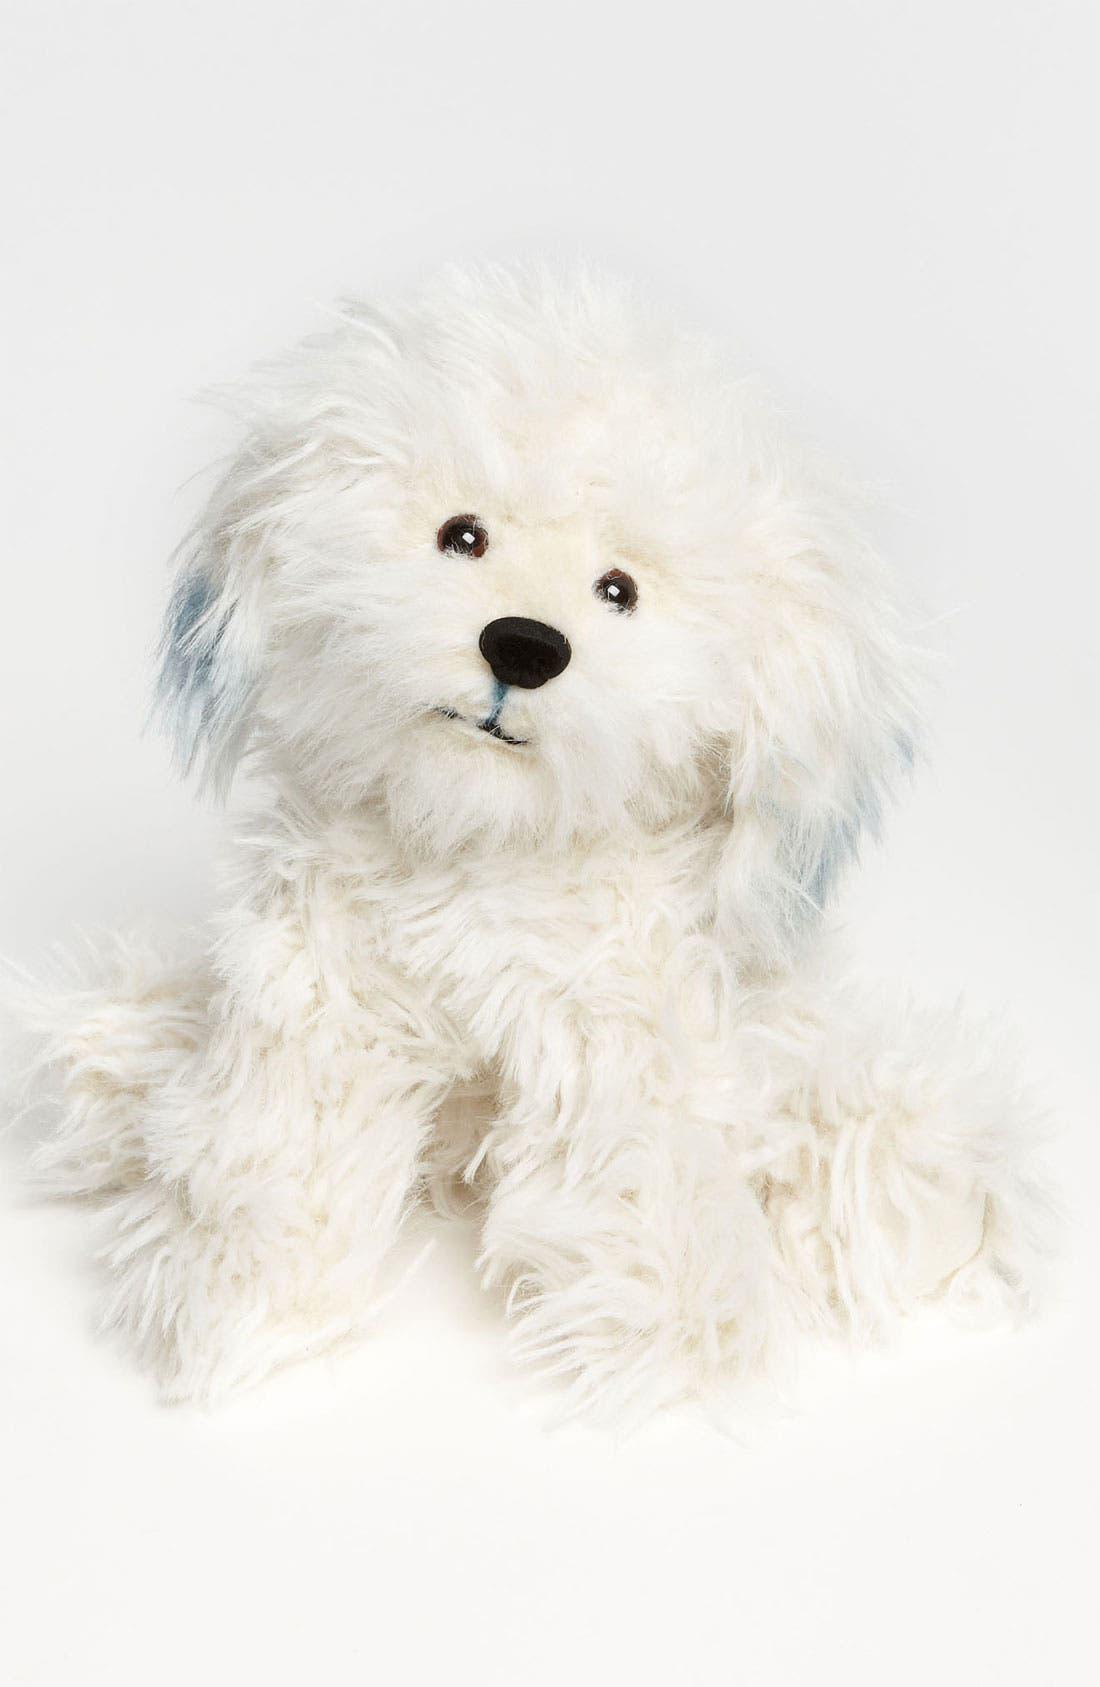 Alternate Image 1 Selected - Gund 'Dreyfus' Stuffed Animal